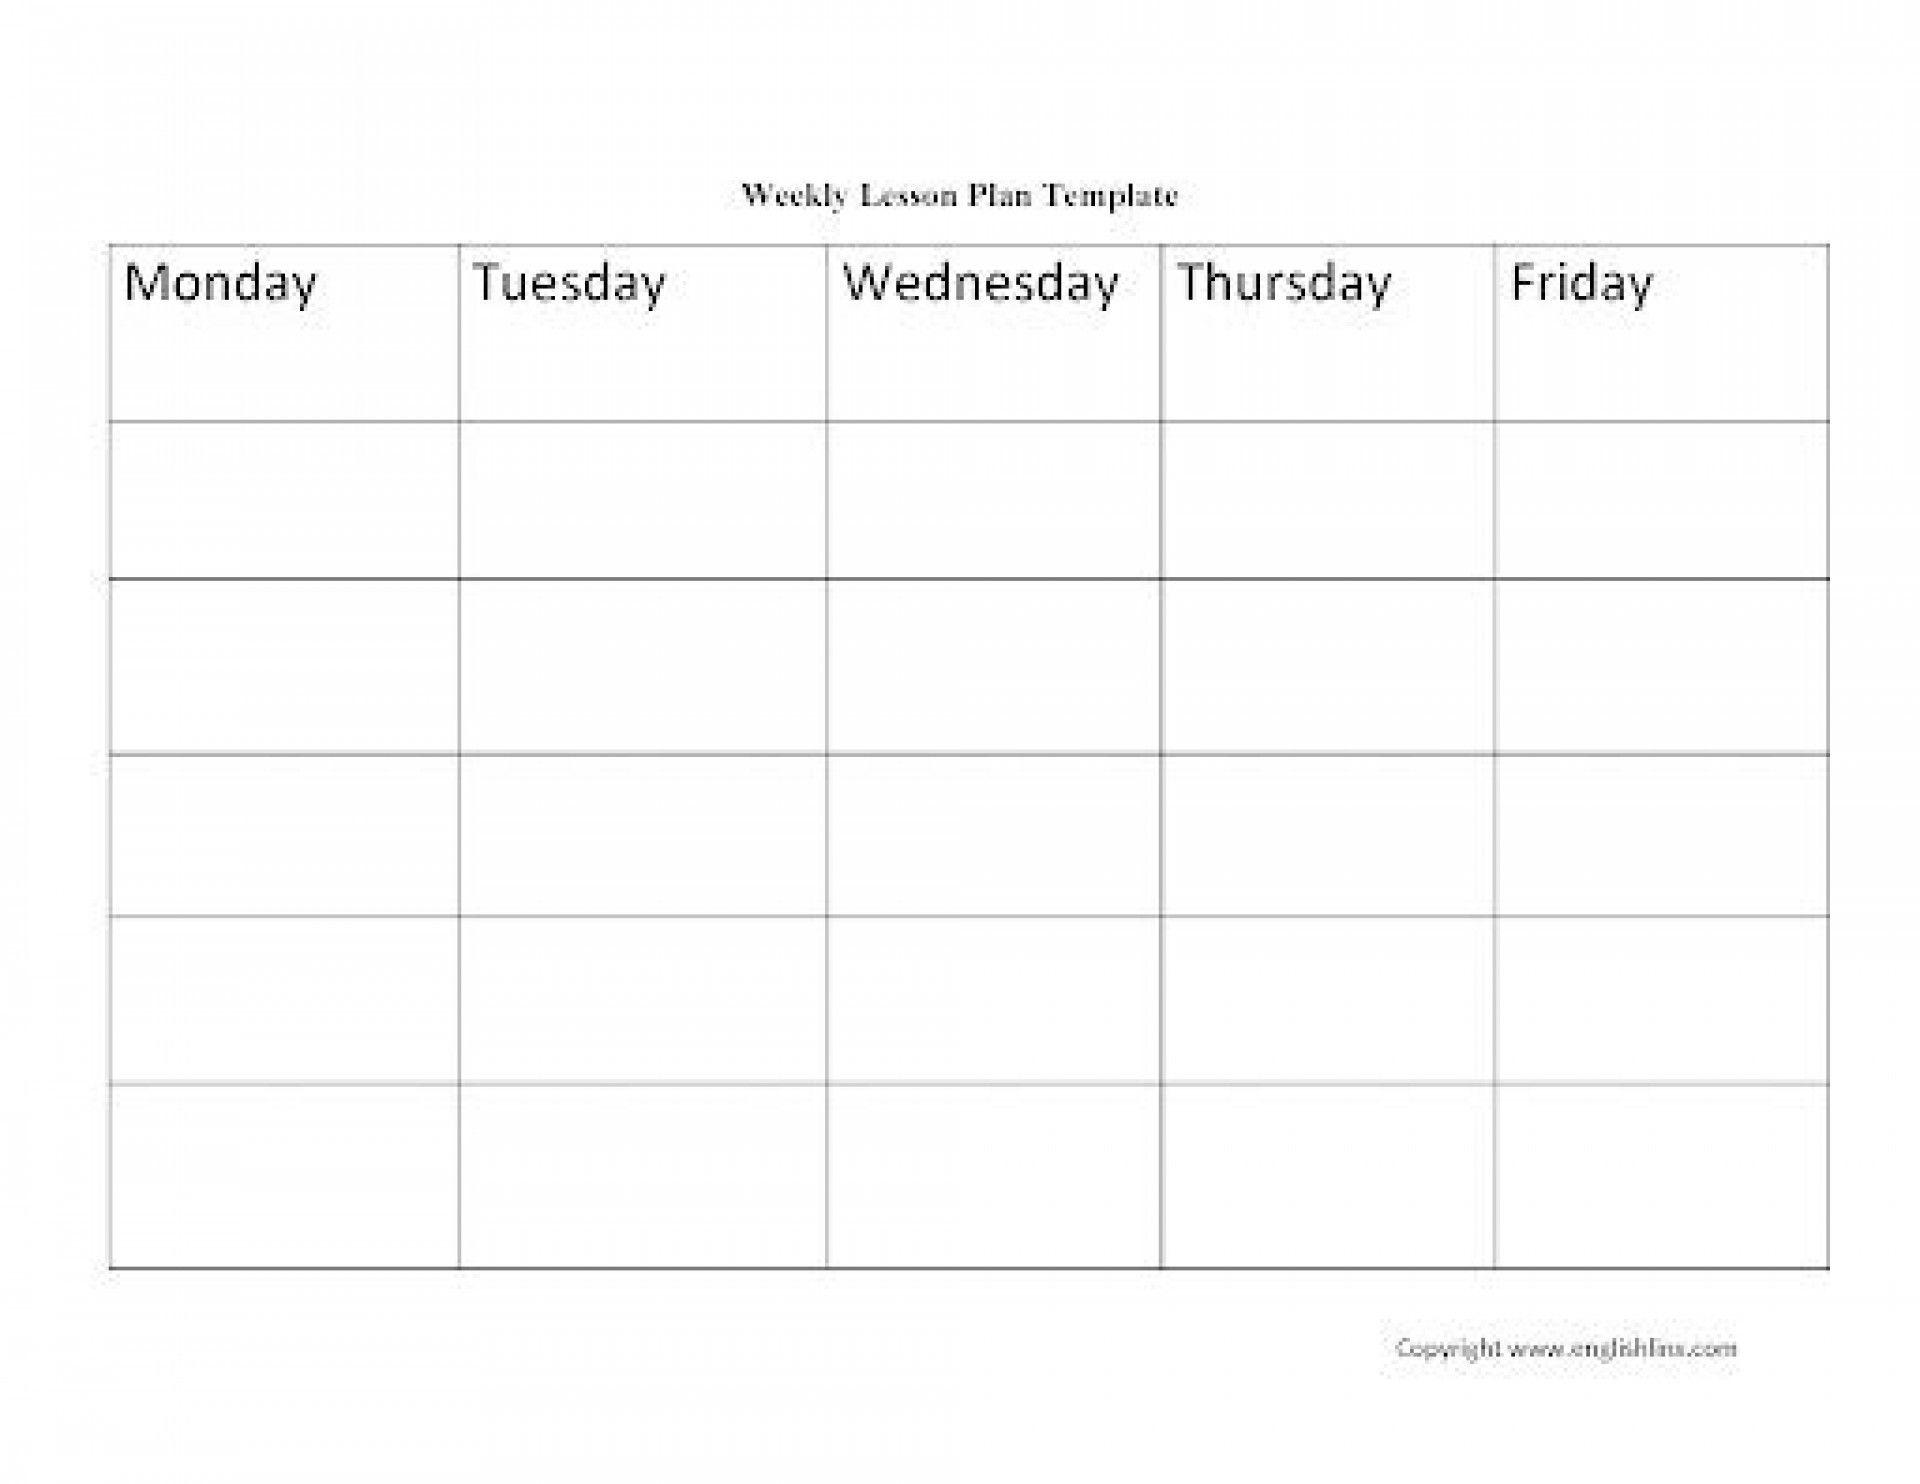 001 Top Printable Lesson Plan Template Weekly Photo  Blank Pdf Monthly Free PreschoolFull